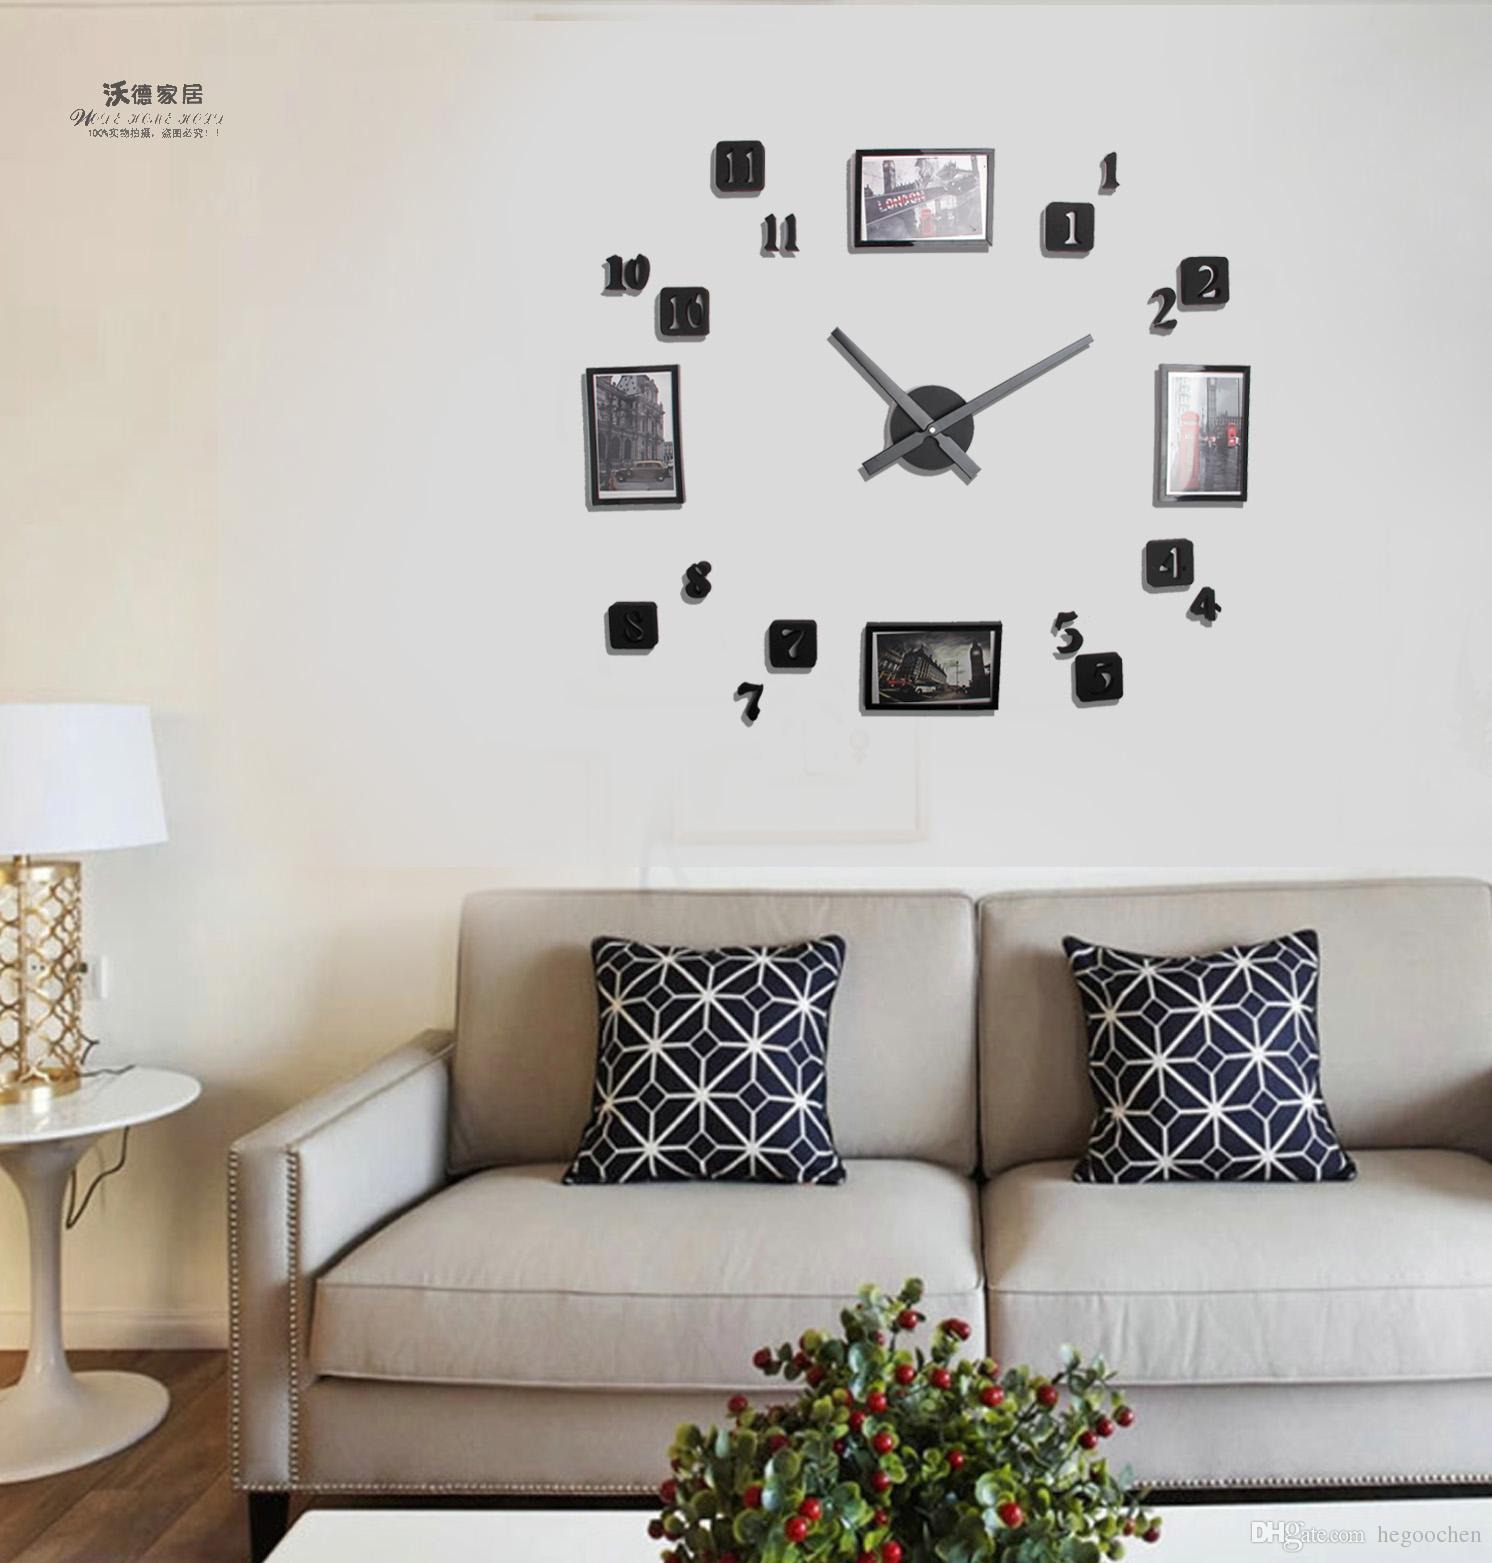 Charming 2018 New Design European Style Photo Frame Diy Digital Black Clock Fashion Personality Bedroom Living 2018 New Design European Style Photo Frame Diy Digital Black Clock furniture Digital Clock For Living Room